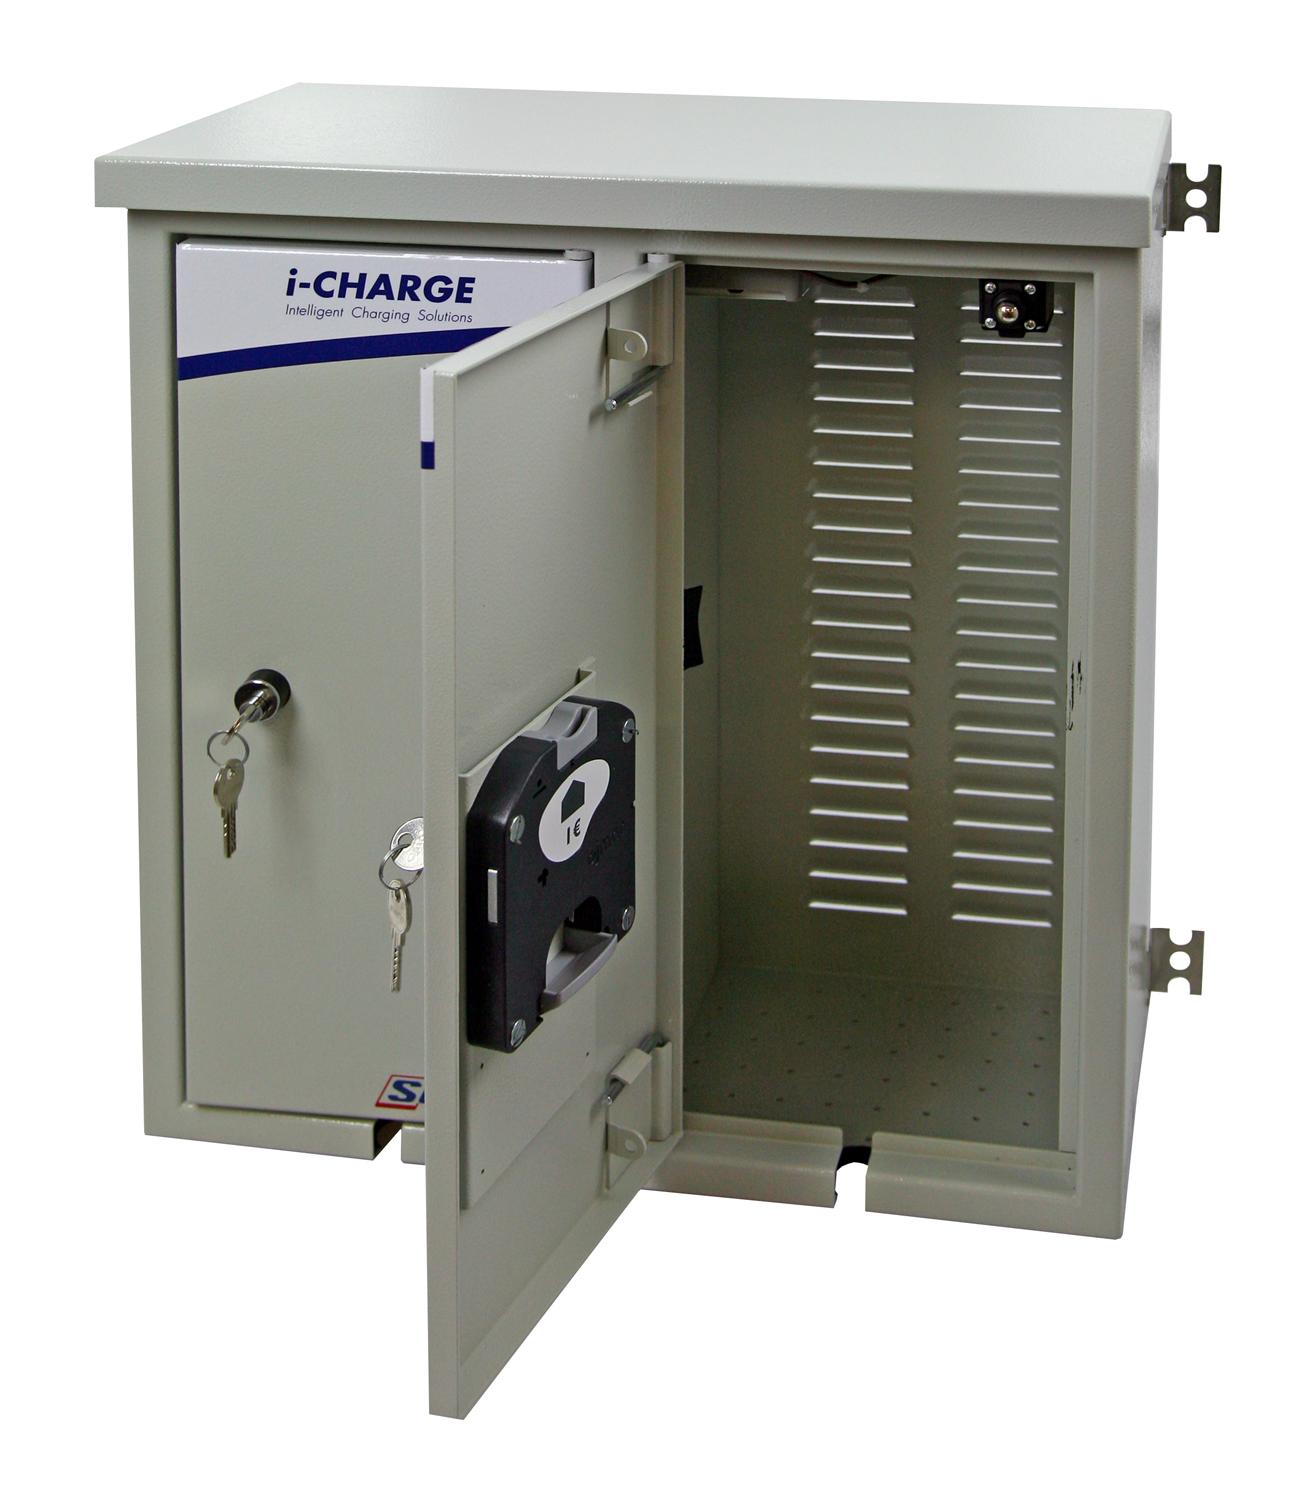 1 Stk i-CHARGE easy pack 2x Schuko 3,7kW, mit versperrbarer Türe EMEPS020--